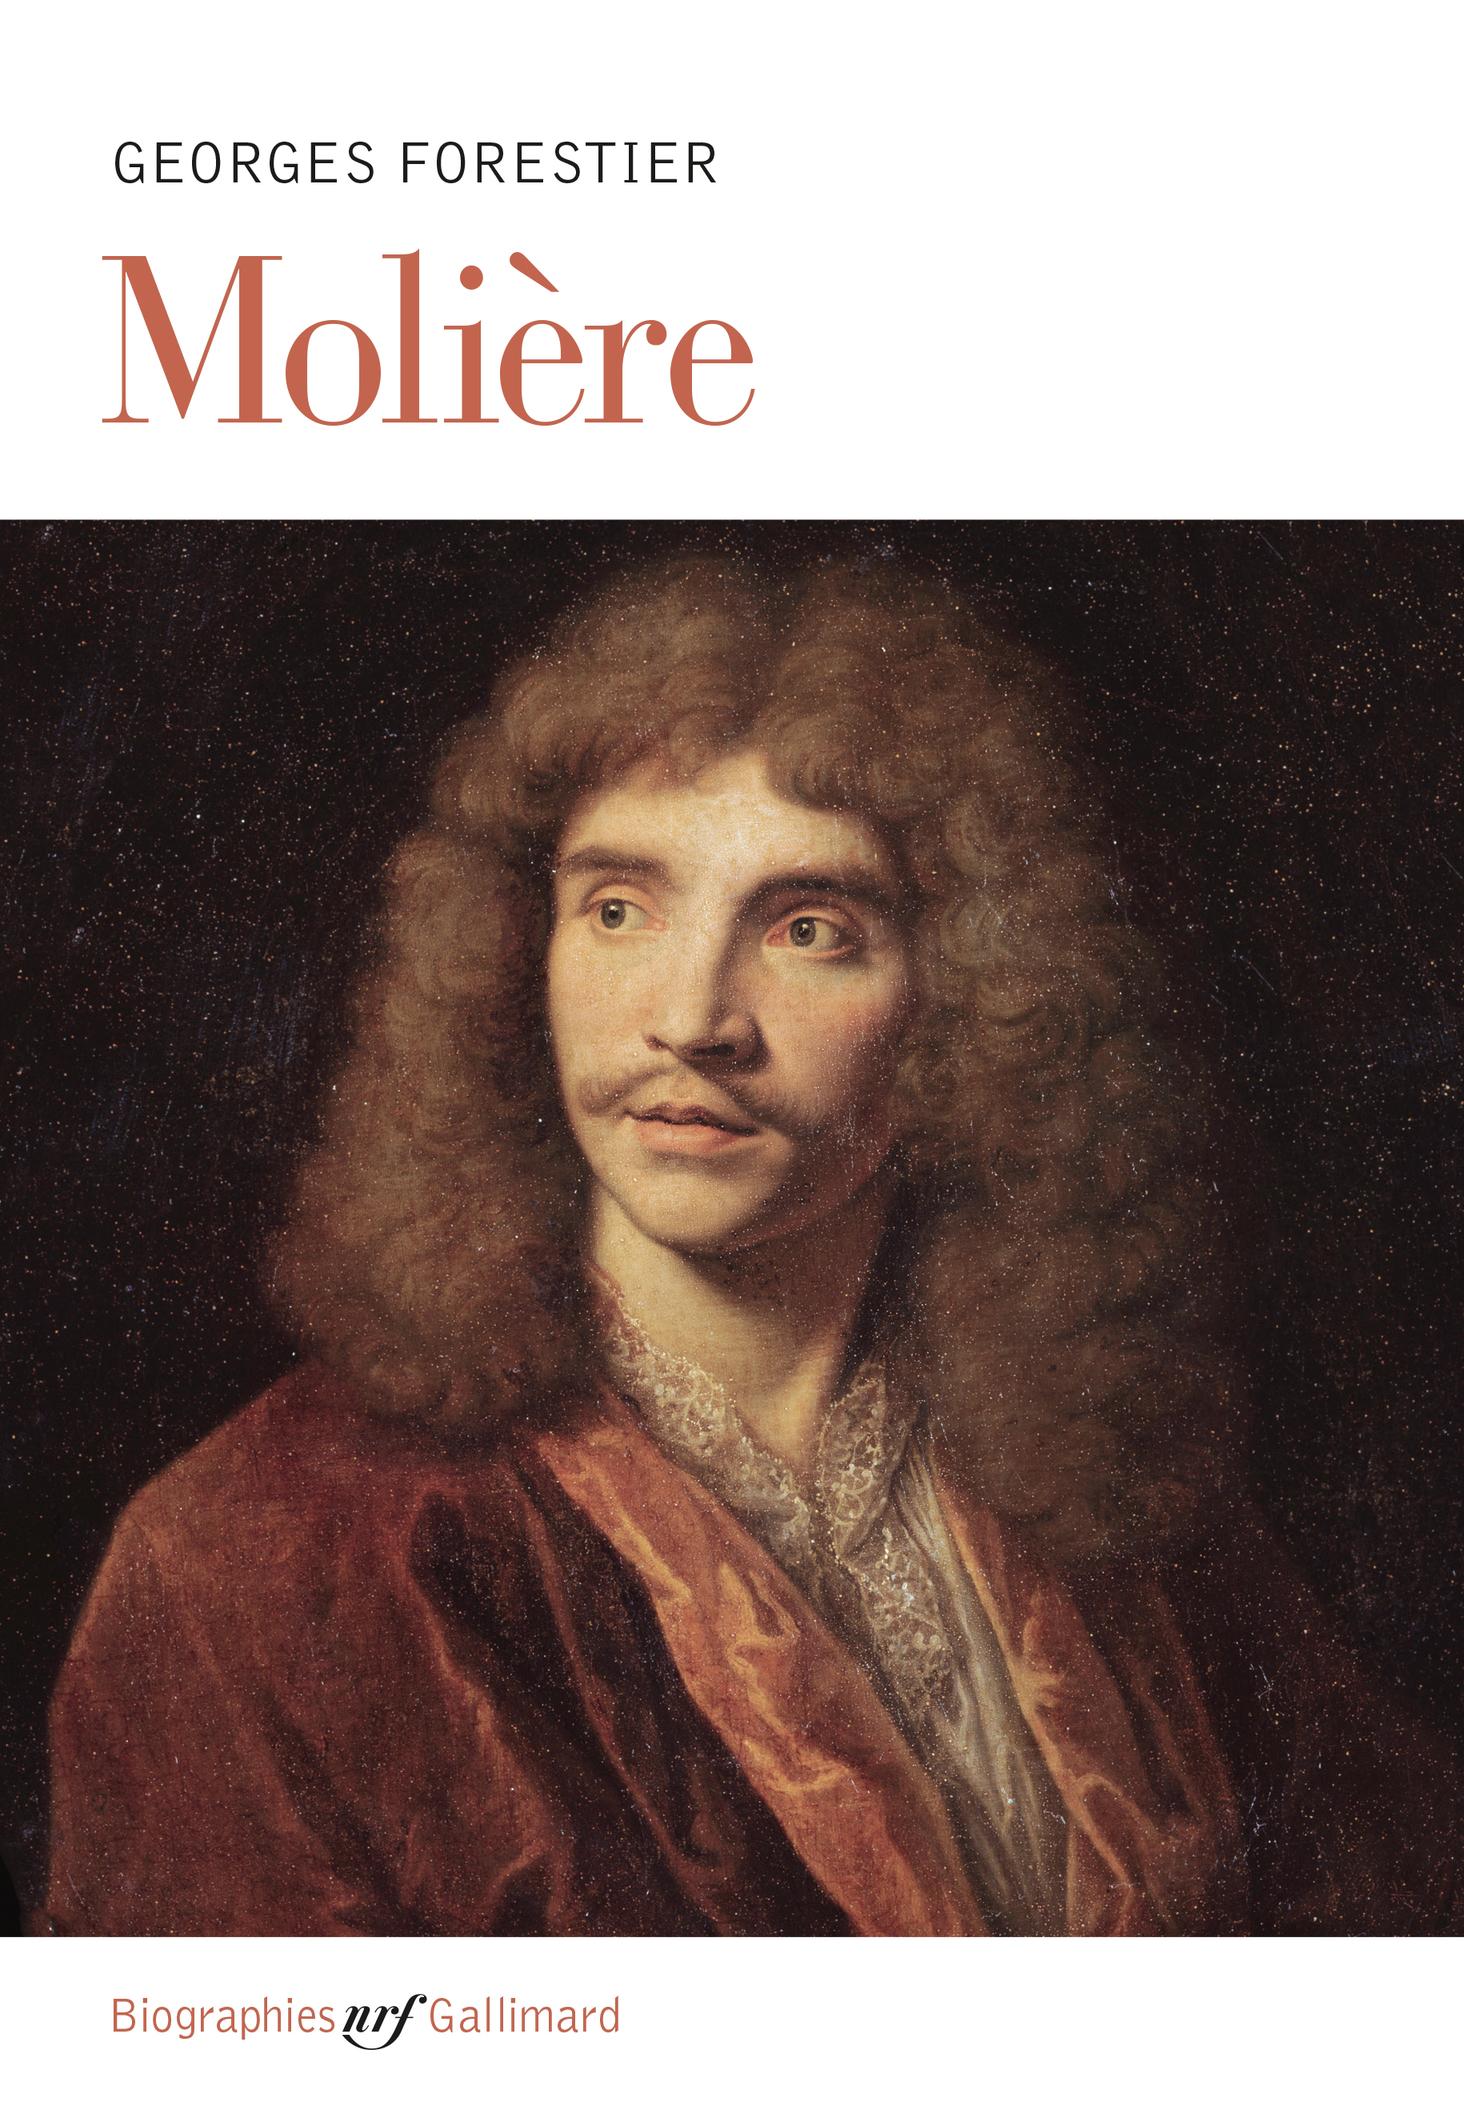 Molière backstage